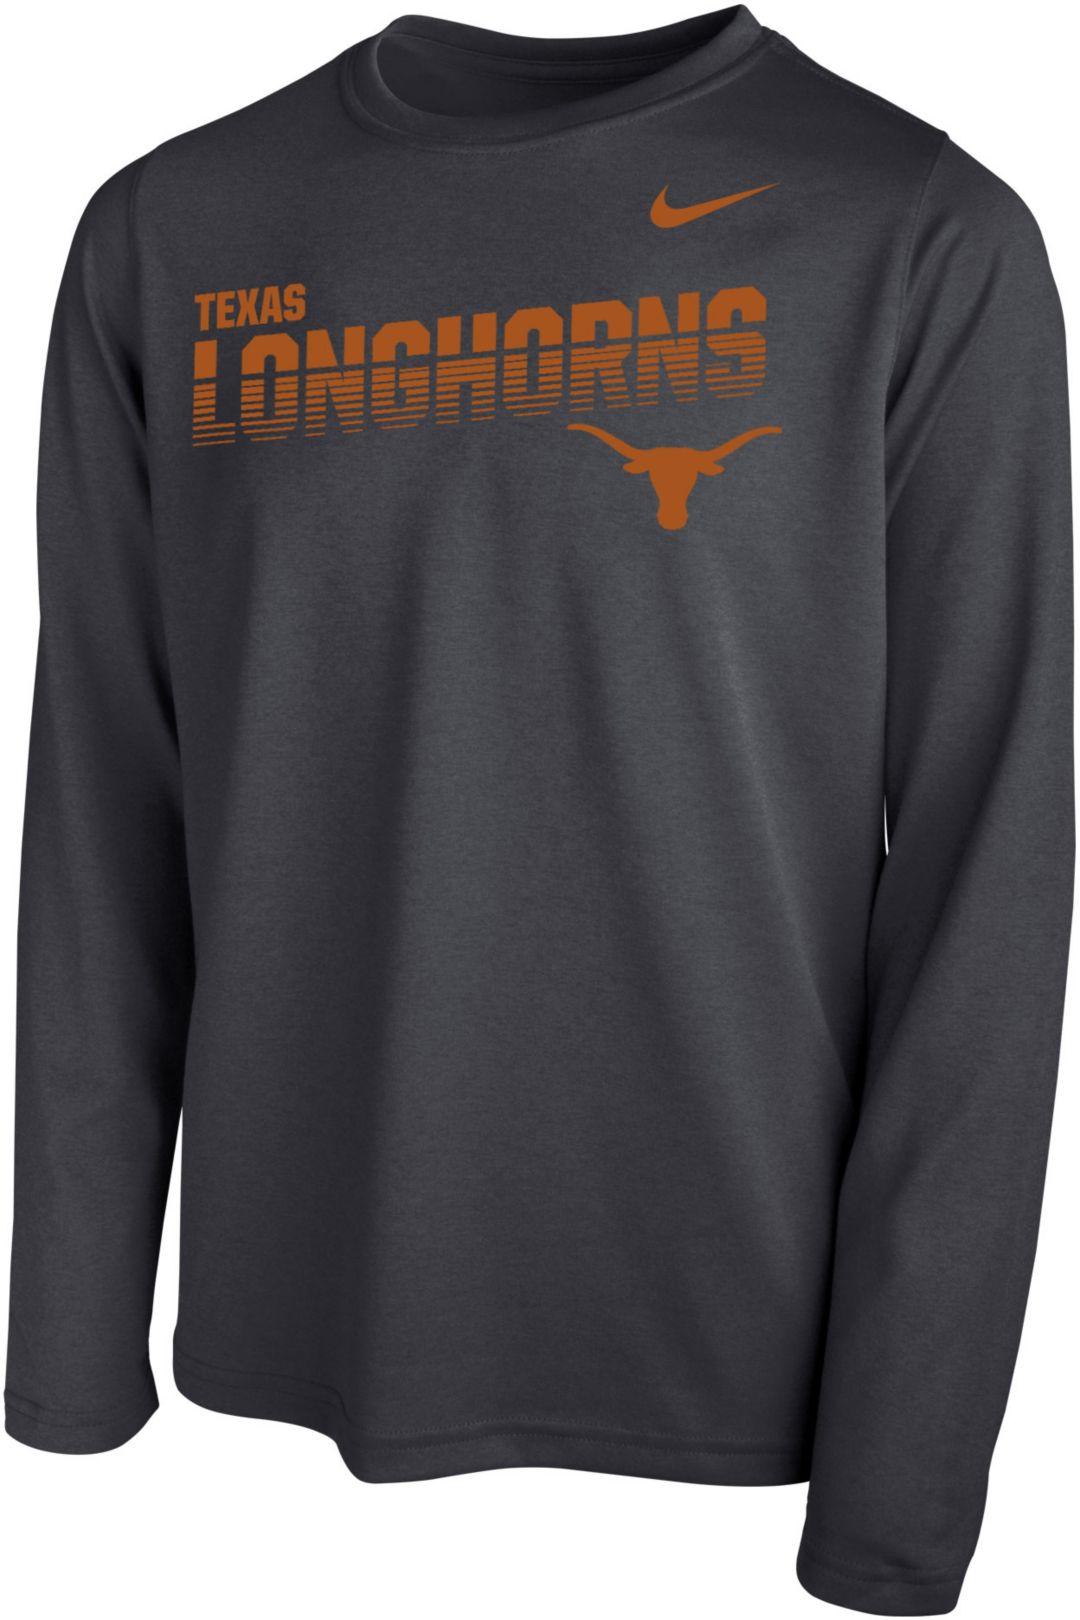 5adee703 Nike Youth Texas Longhorns Grey Legend Football Sideline Long Sleeve T-Shirt